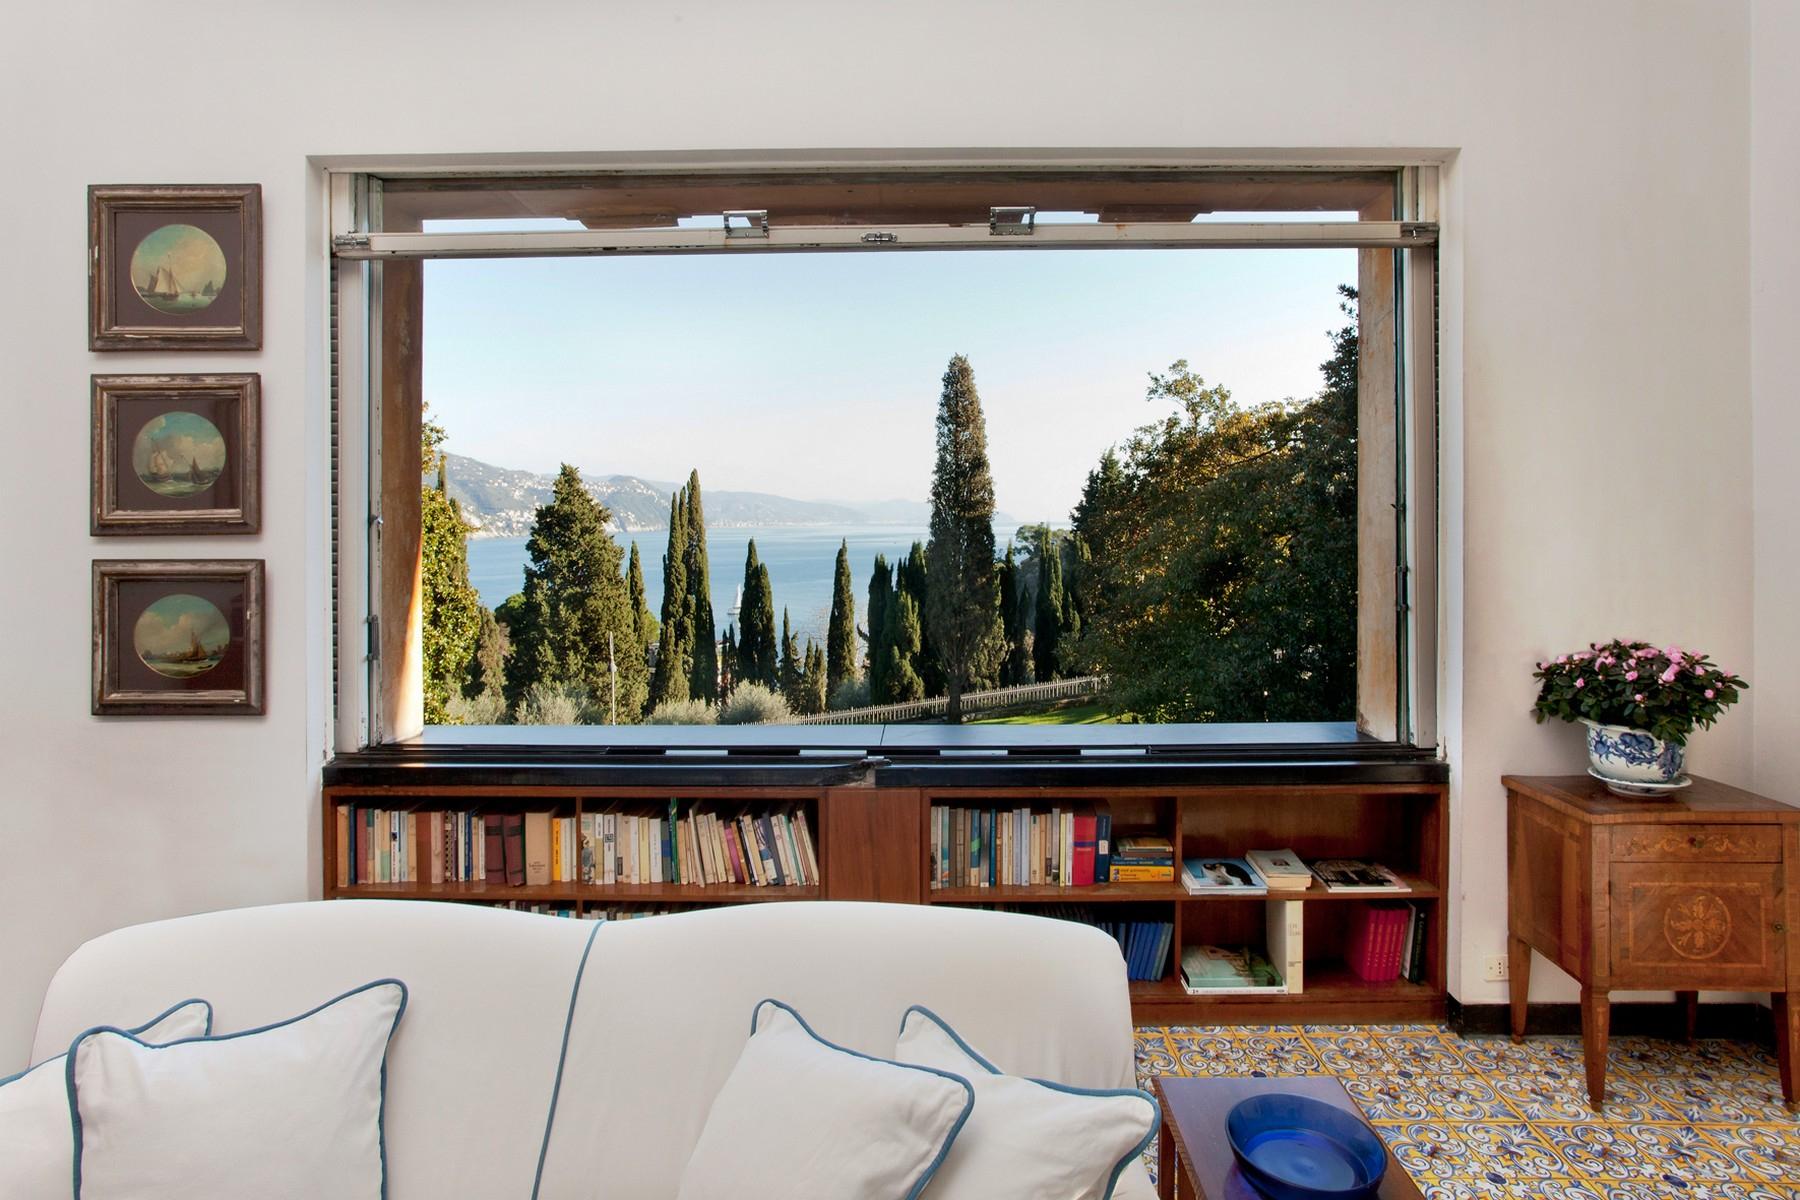 Villa in Vendita a Santa Margherita Ligure via san michele di pagana